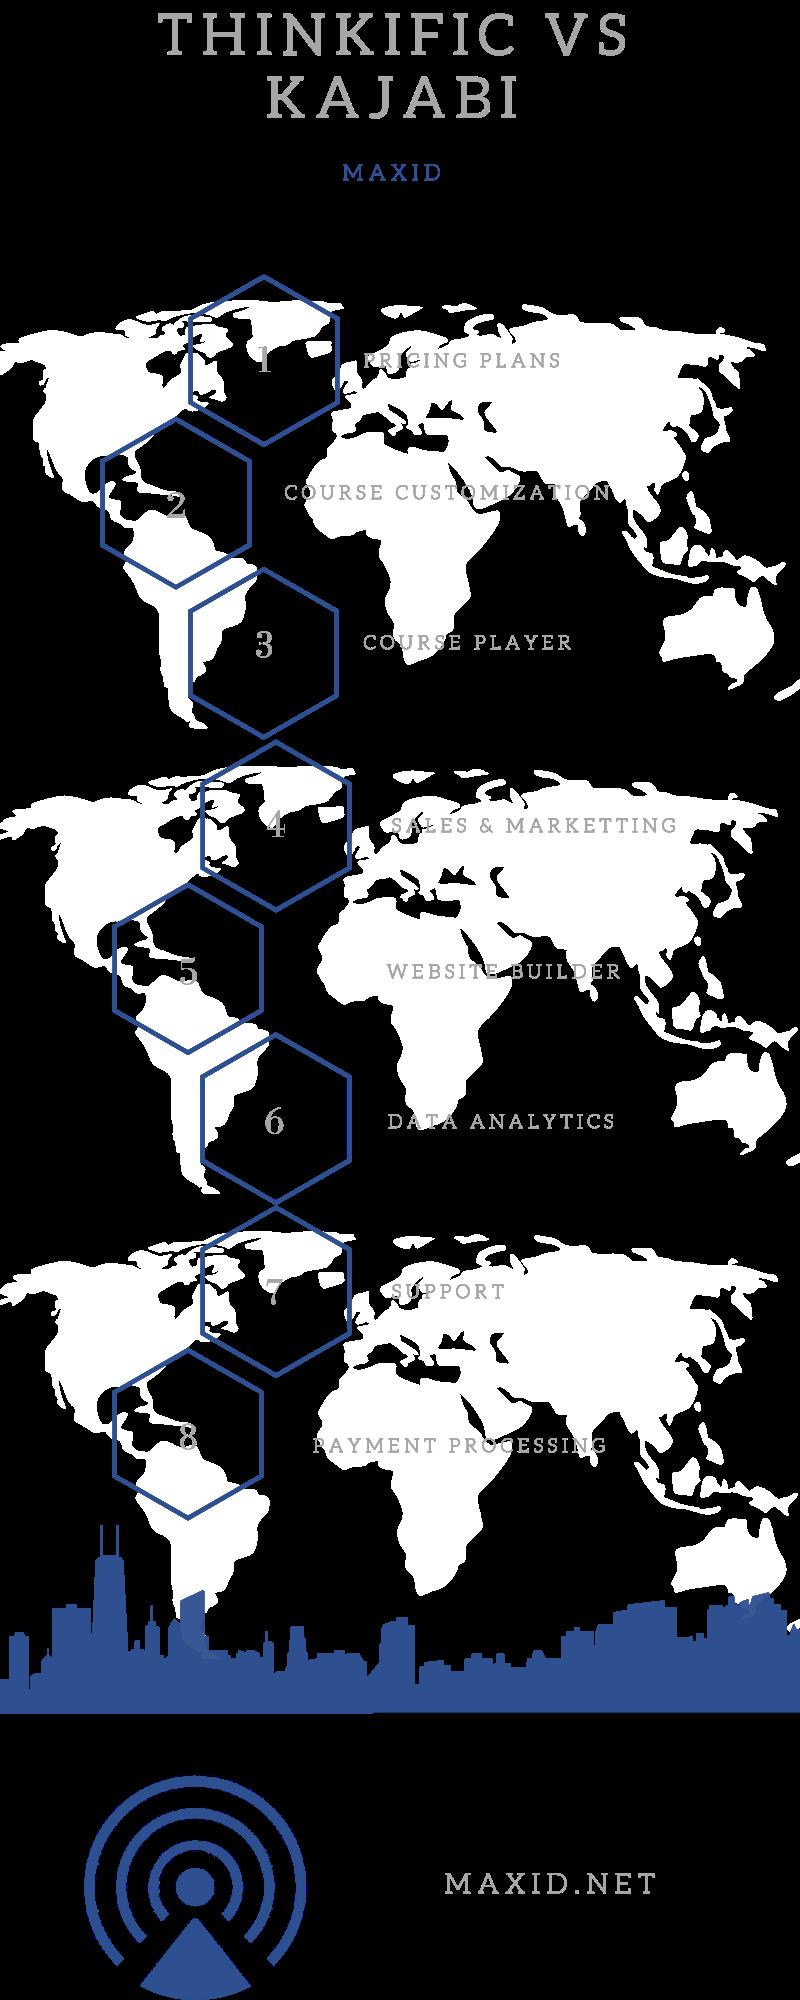 Kajabi-Infographic